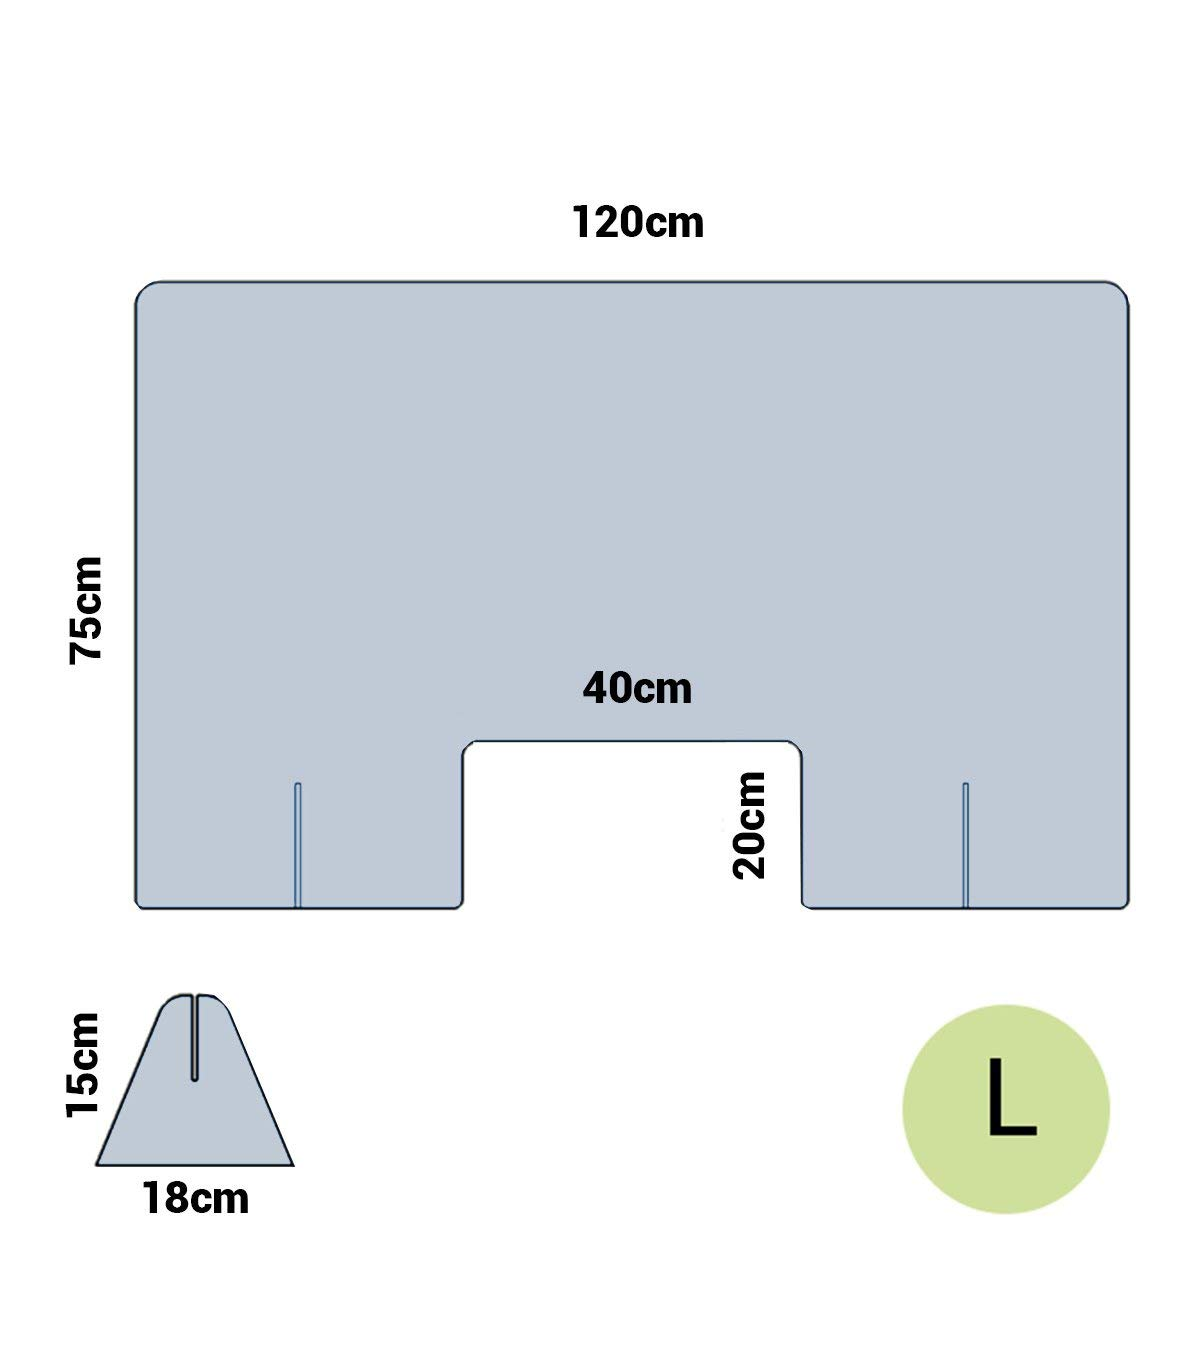 Mampara anticontagio de metracrilato a medida 65 cm ancho, Sin Ventana